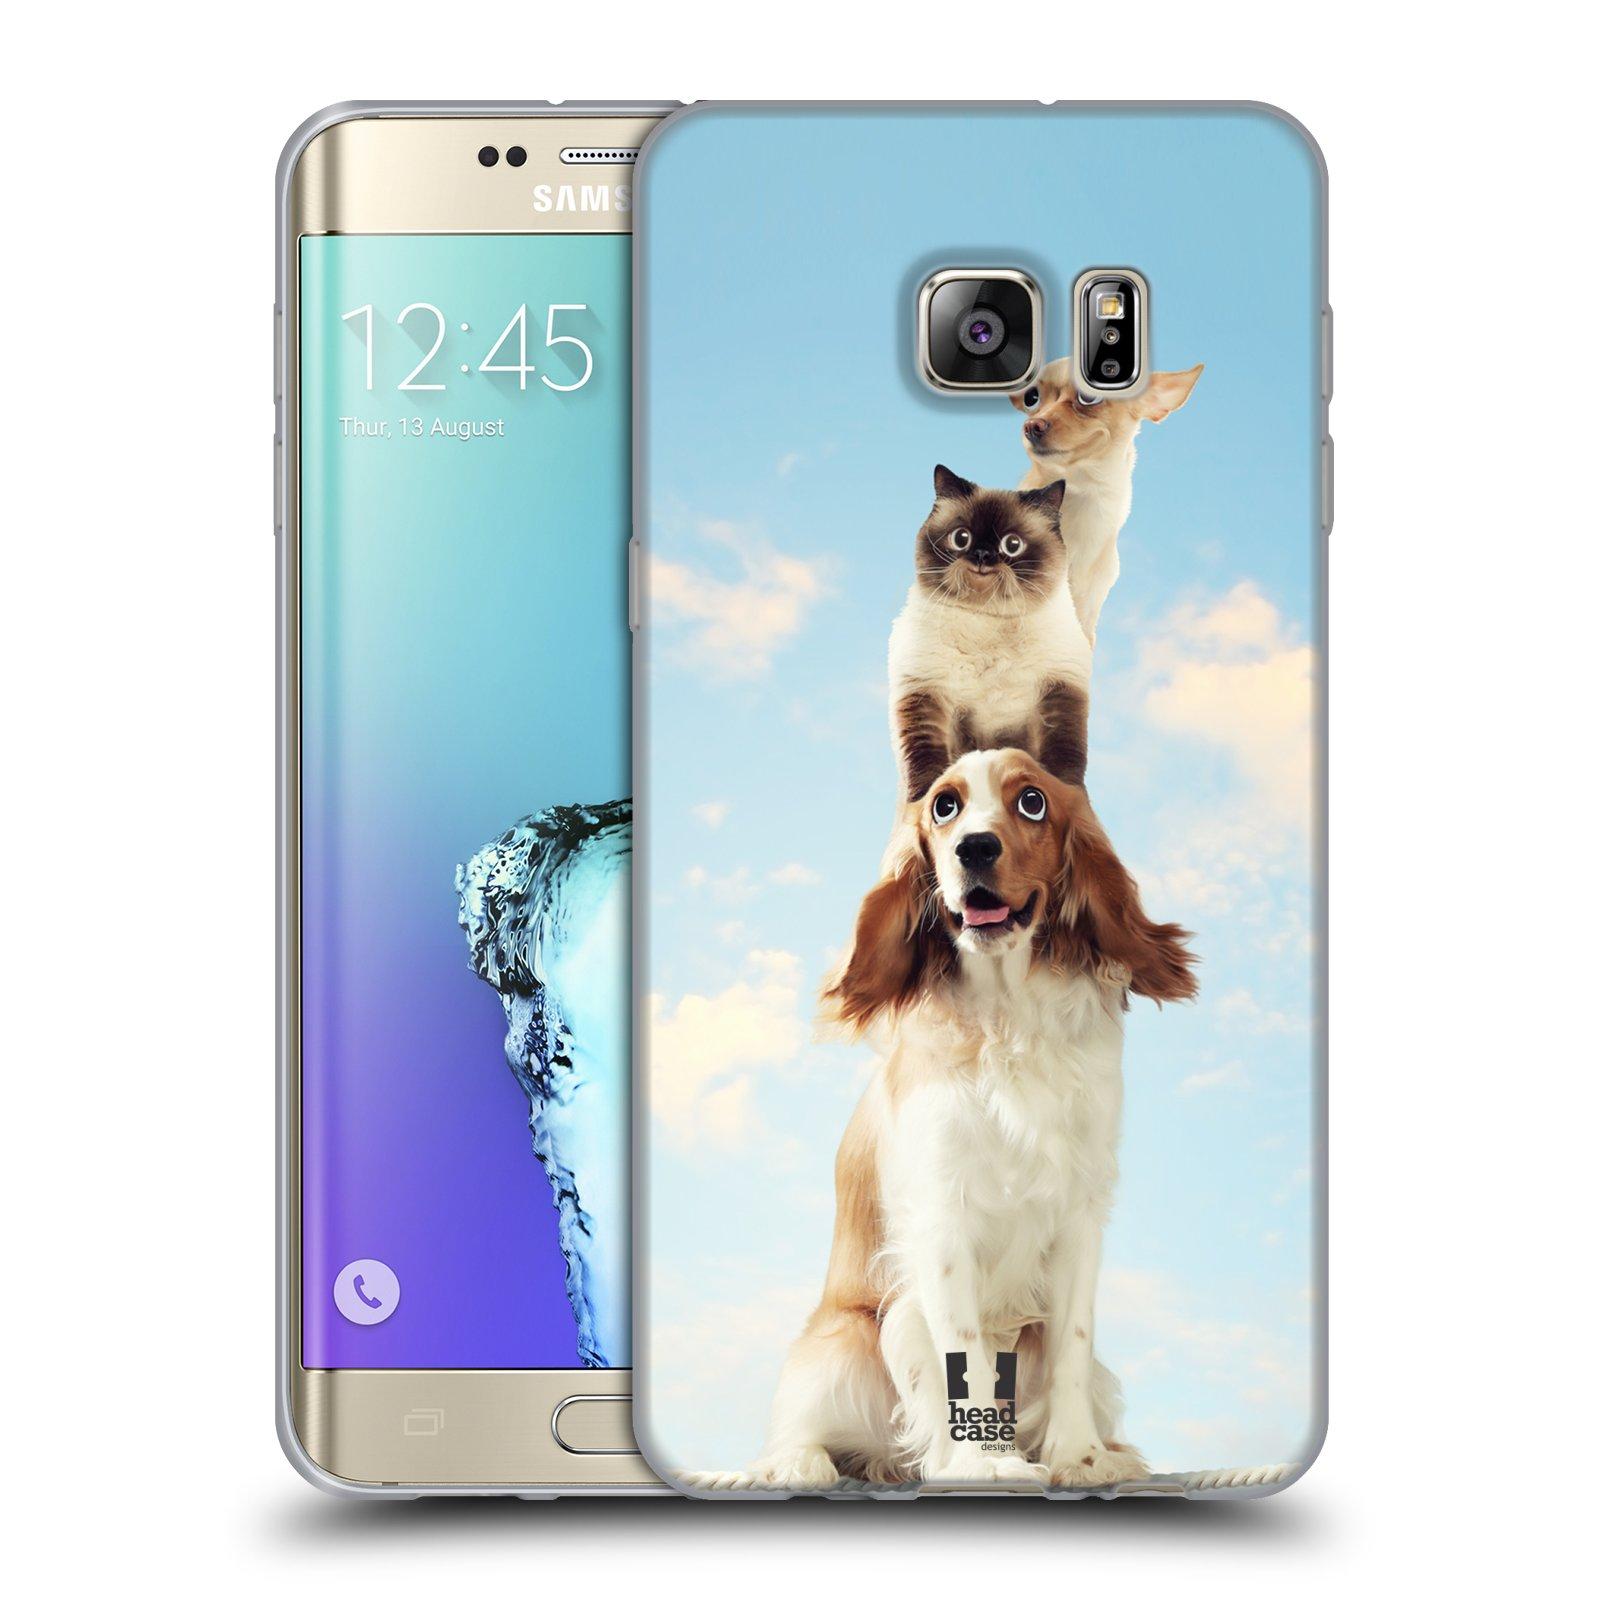 HEAD CASE silikonový obal na mobil Samsung Galaxy S6 EDGE PLUS vzor Legrační zvířátka zvířecí totem